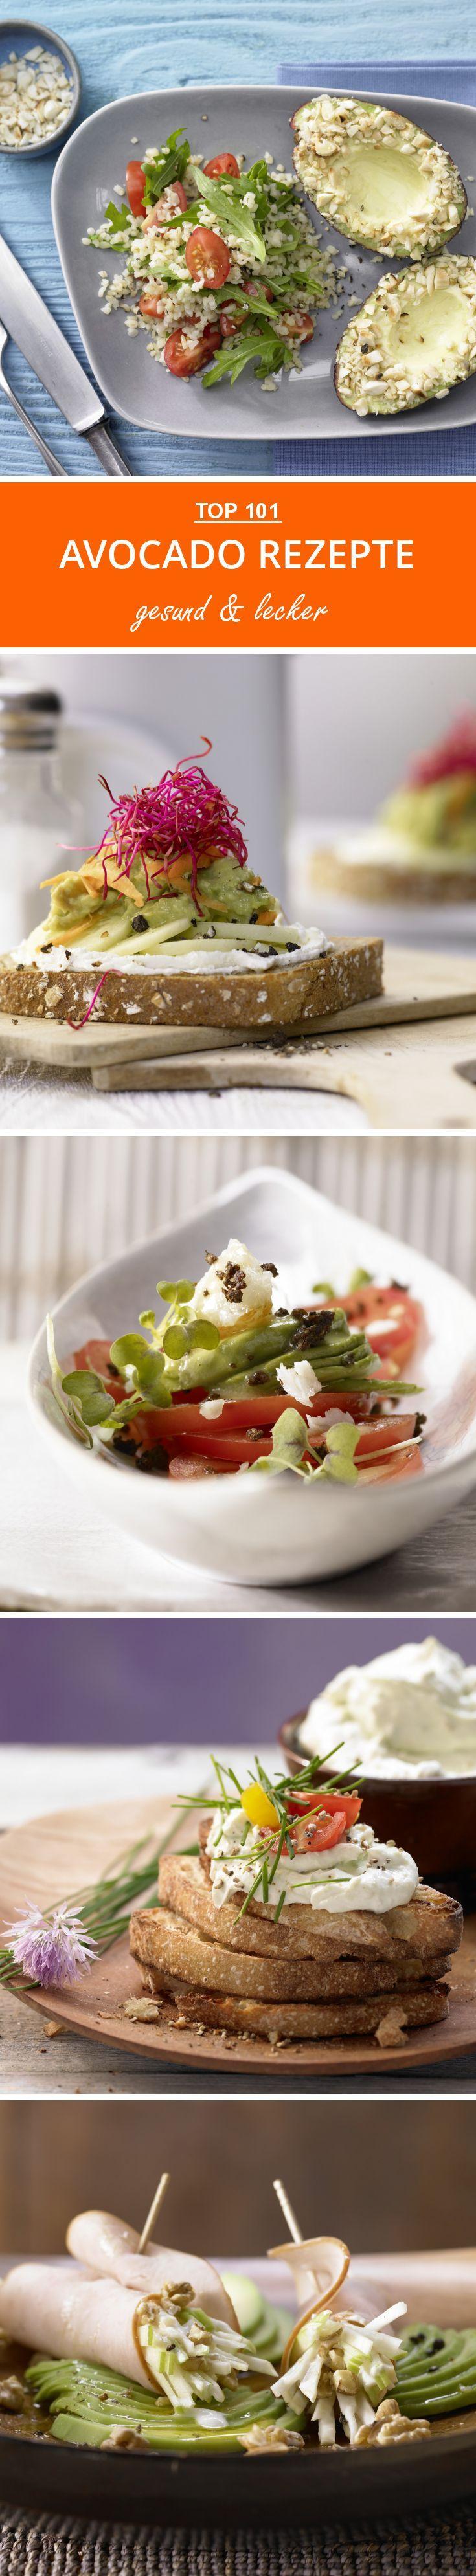 Avocado Rezepte | eatsmarter.de